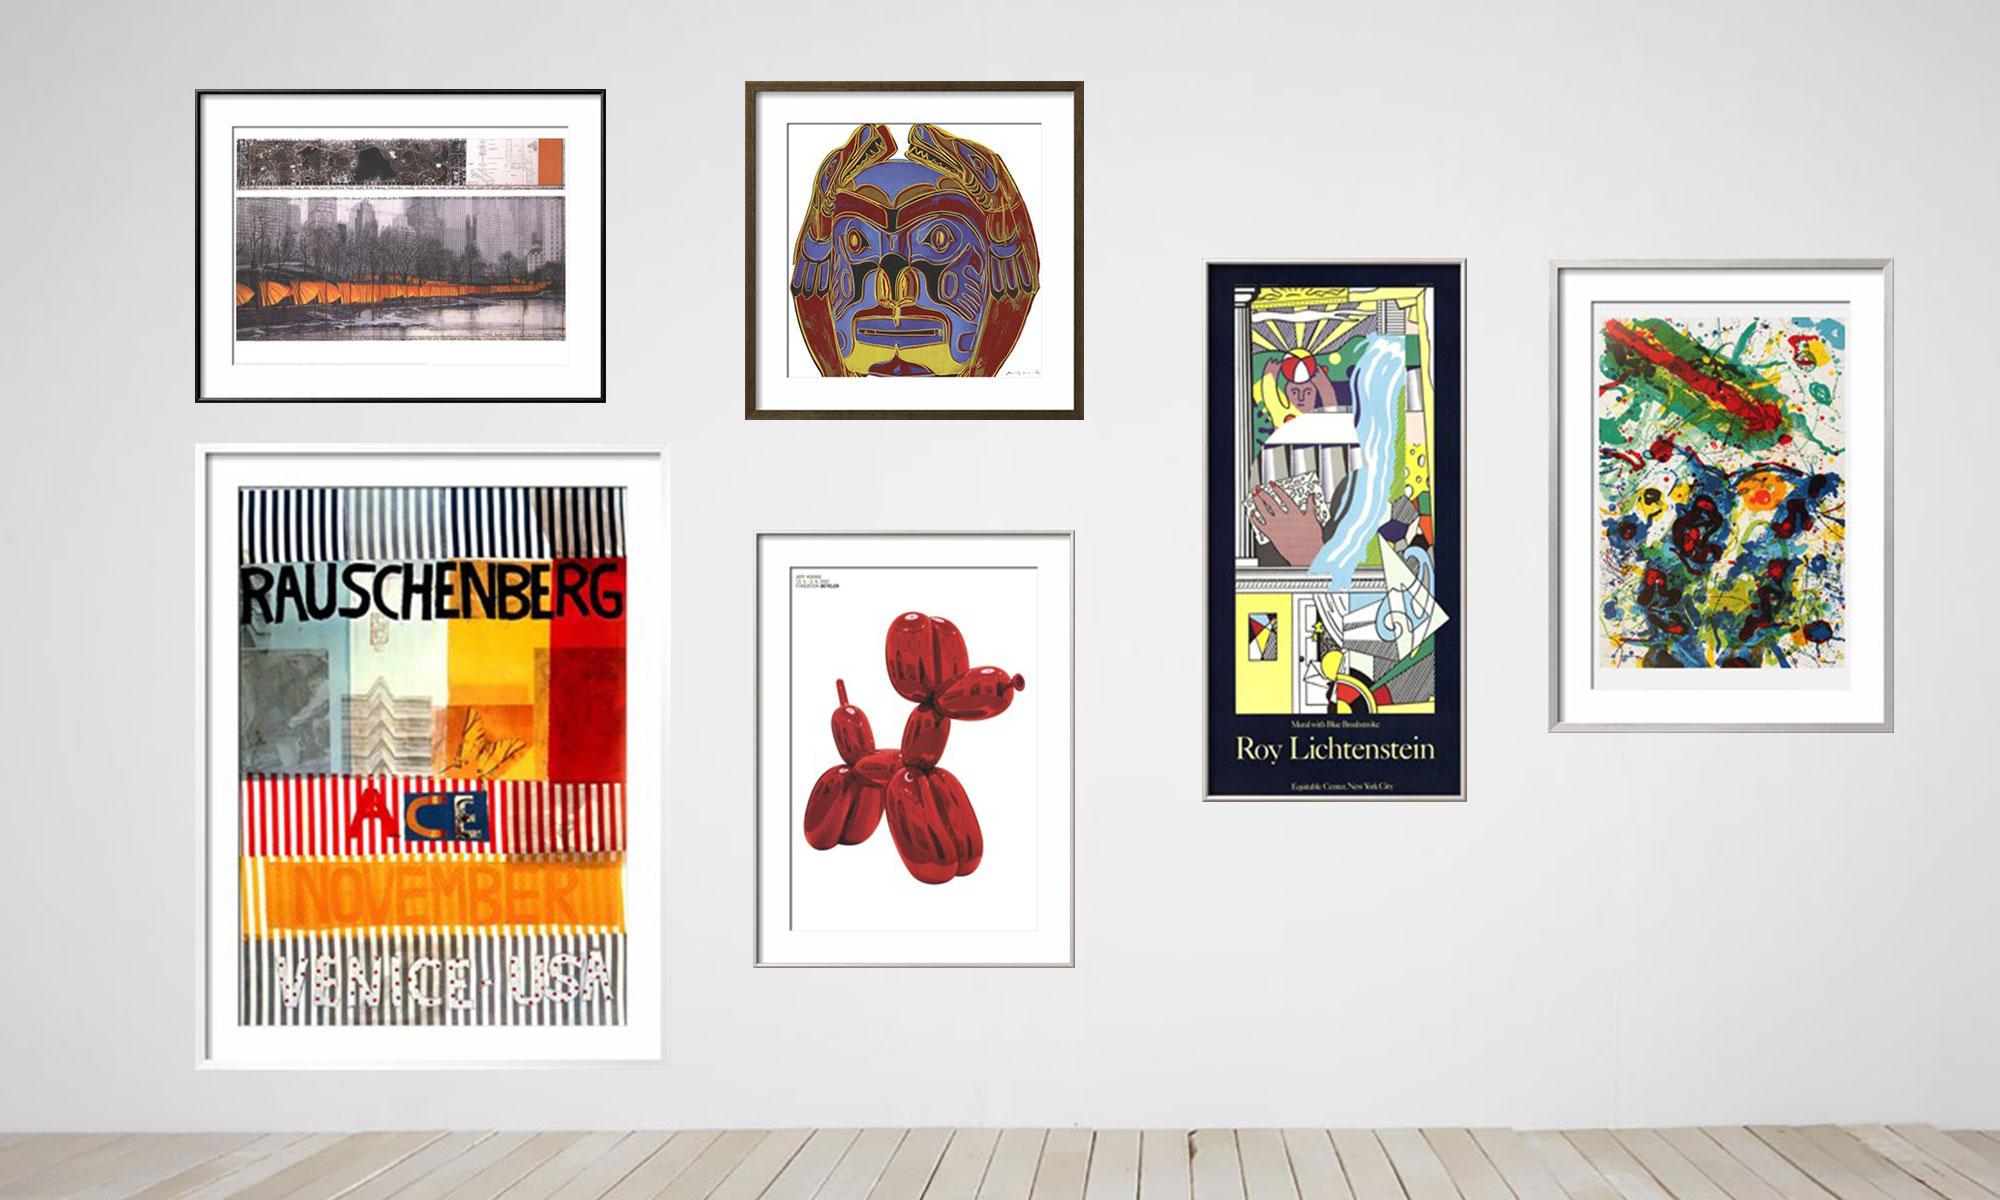 oversized large billboard impressive prints posters art for sale warhol lichtenstein christo rauschenberg koons dog